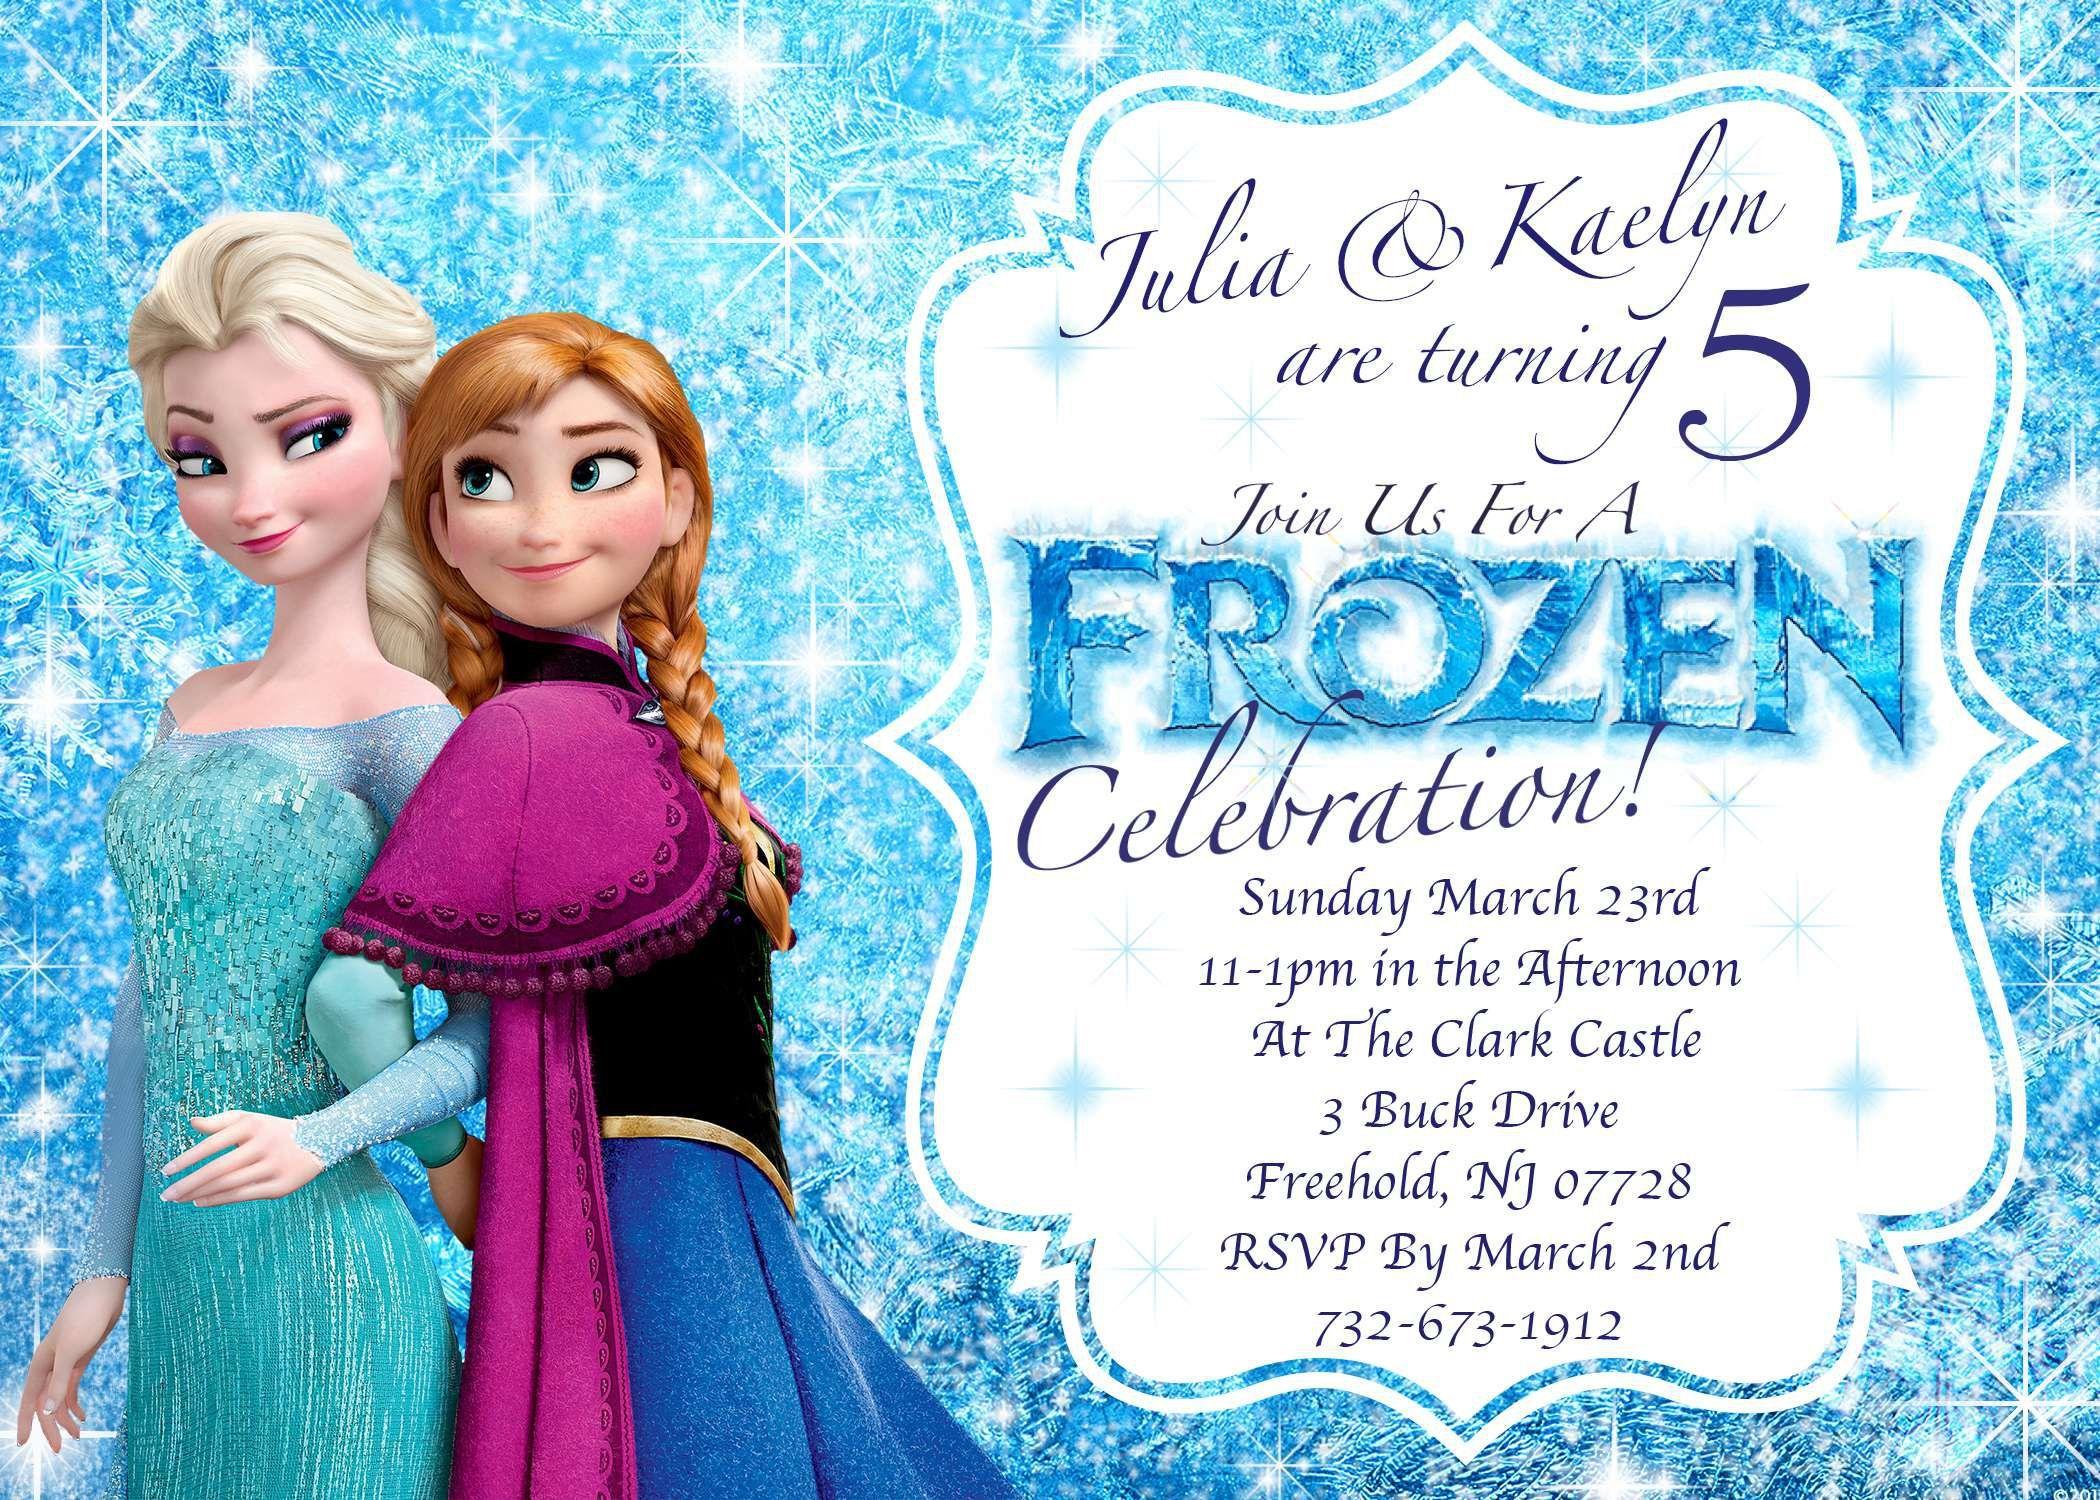 Birthday Invitation Template Disney Princess Birthday Invitation Templates Free Birthday Invitation Template Birthday Invitation Template